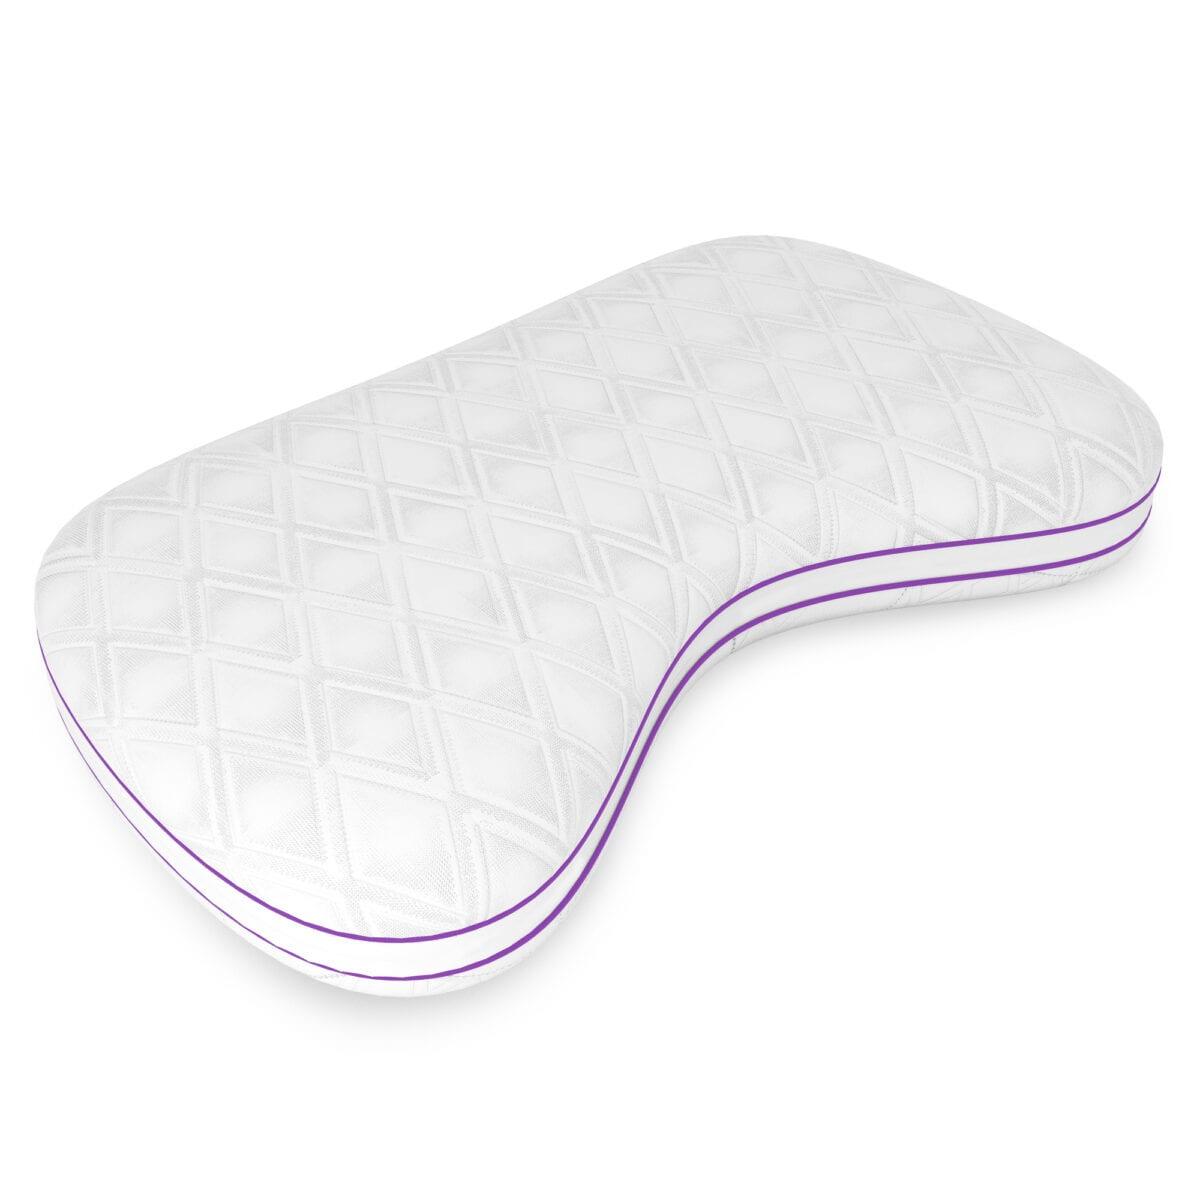 Image of Quest Low Profile Memory Comfort Fiber Pillow